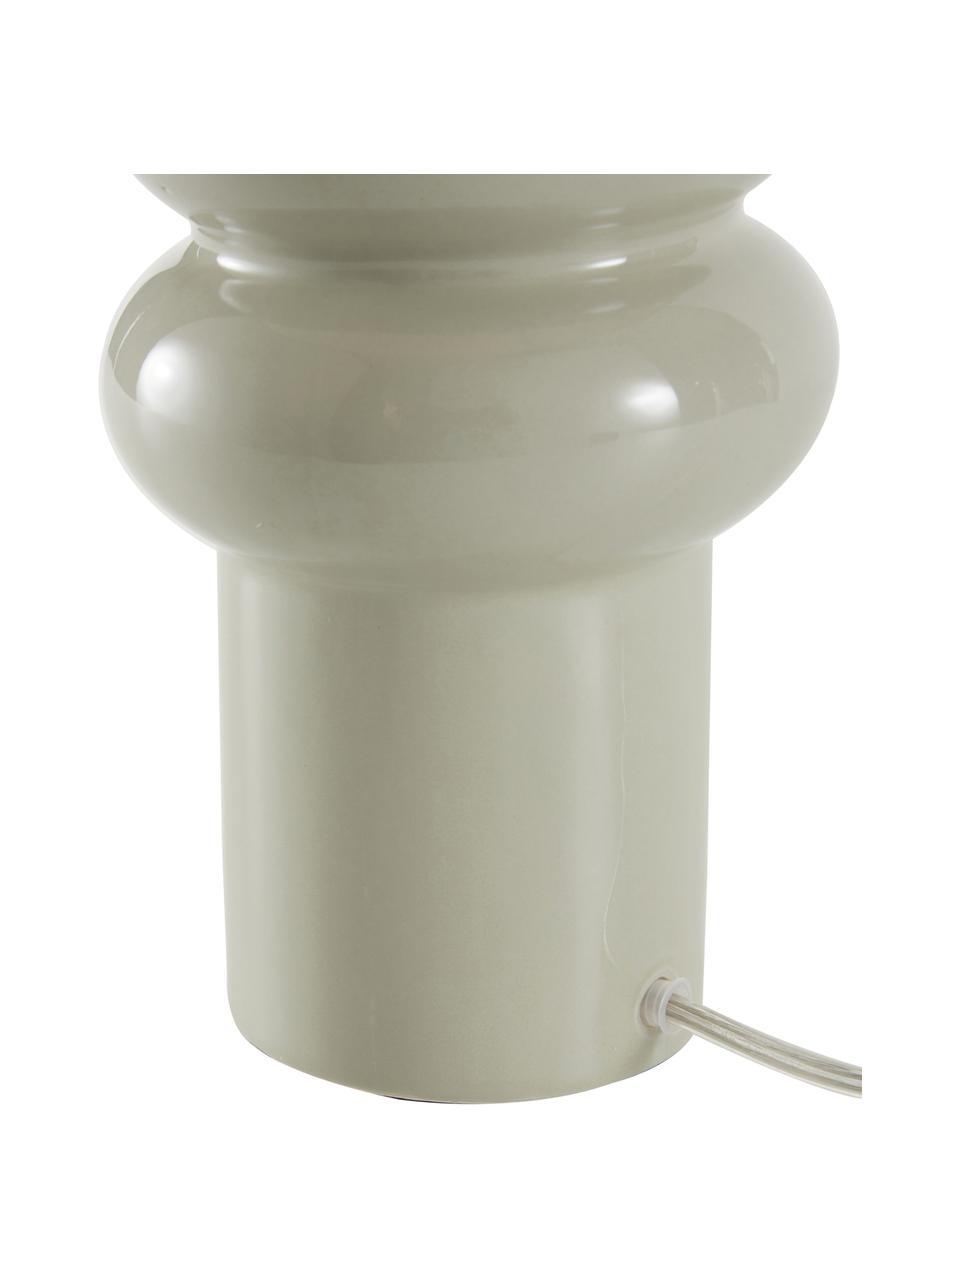 Große Keramik-Tischlampe Christine, Lampenschirm: Textil, Lampenfuß: Keramik, Dekor: Metall, vermessingt, Beige, Grau, Ø 28 x H 53 cm